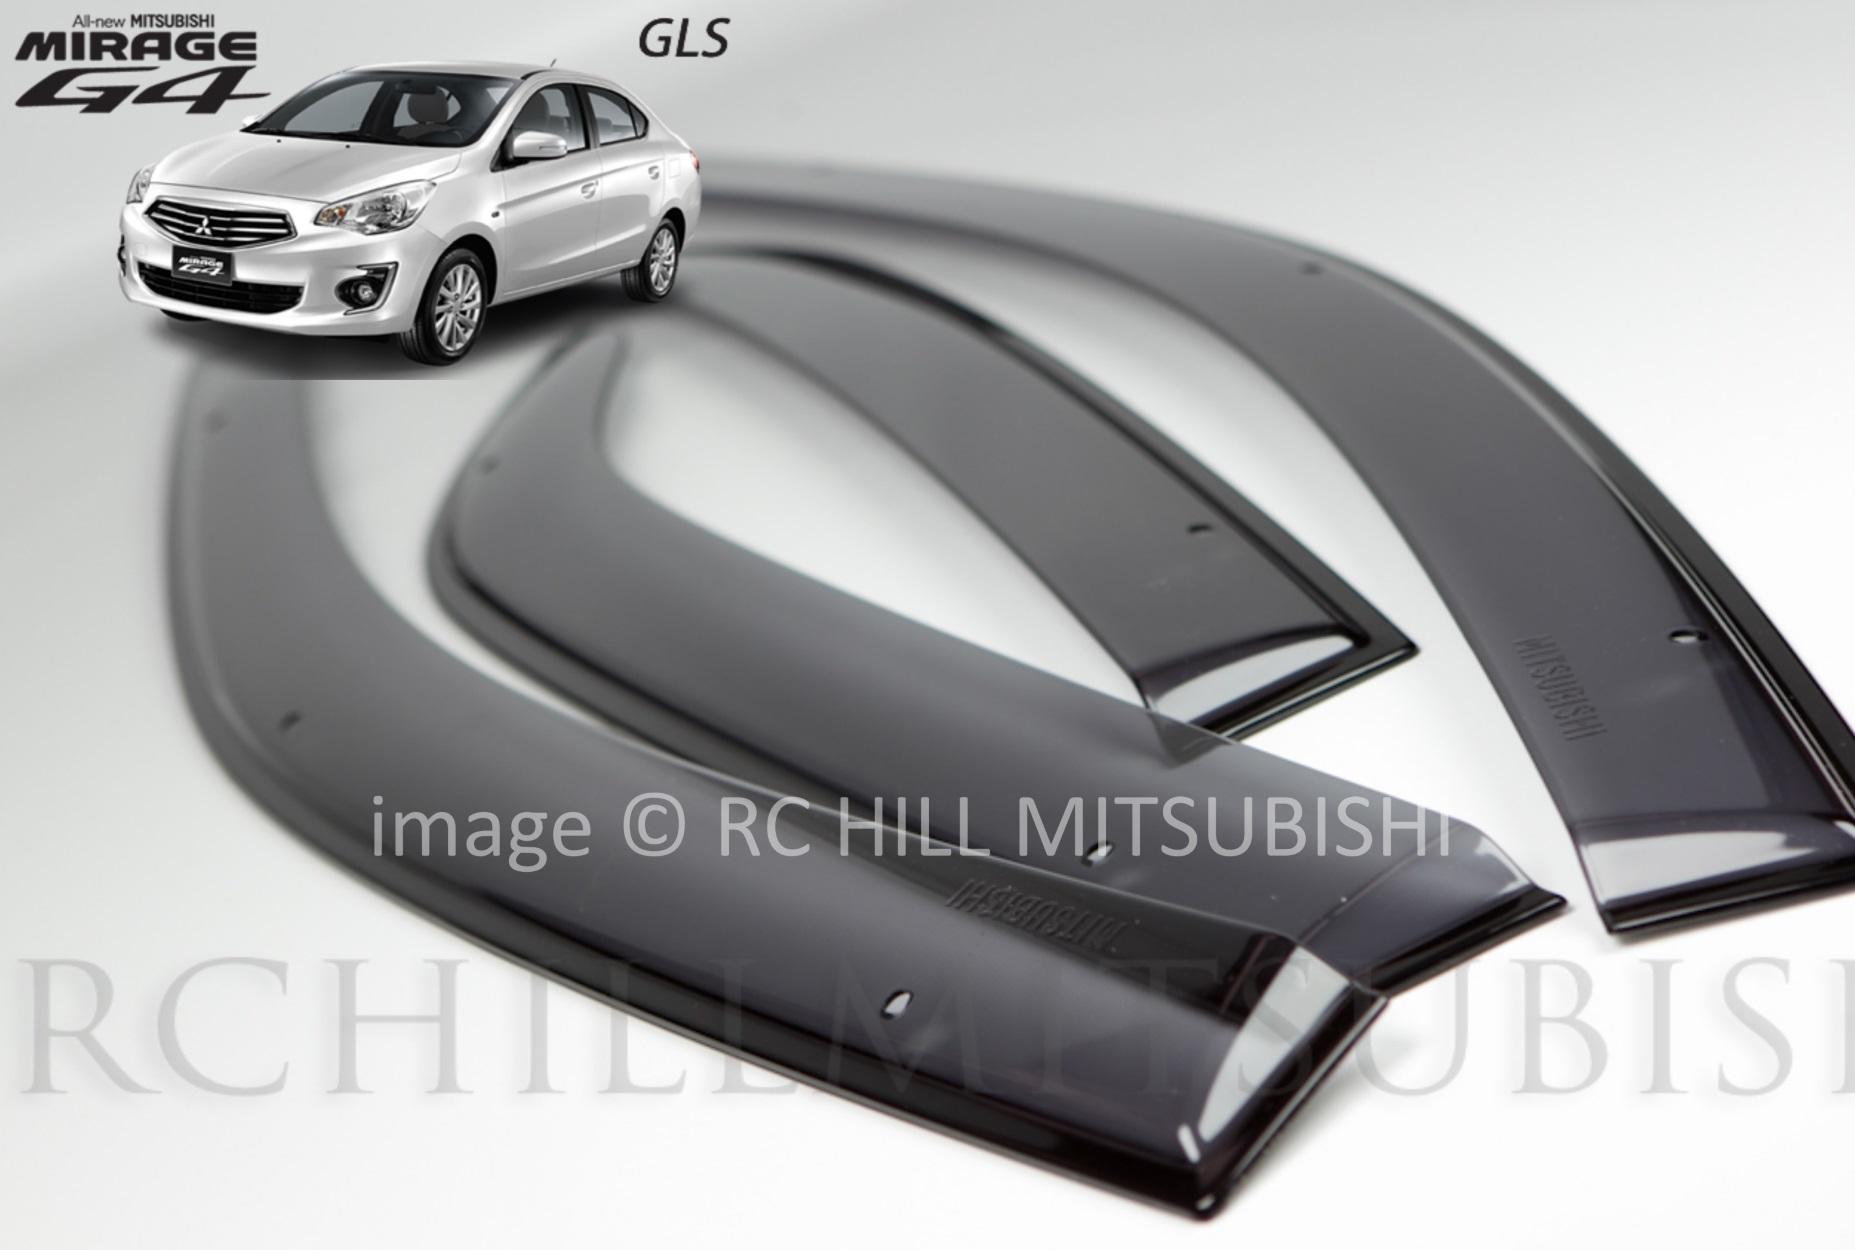 FREE SHIPPING Genuine Mitsubishi Mirage G4 Sedan Side Window Deflectors